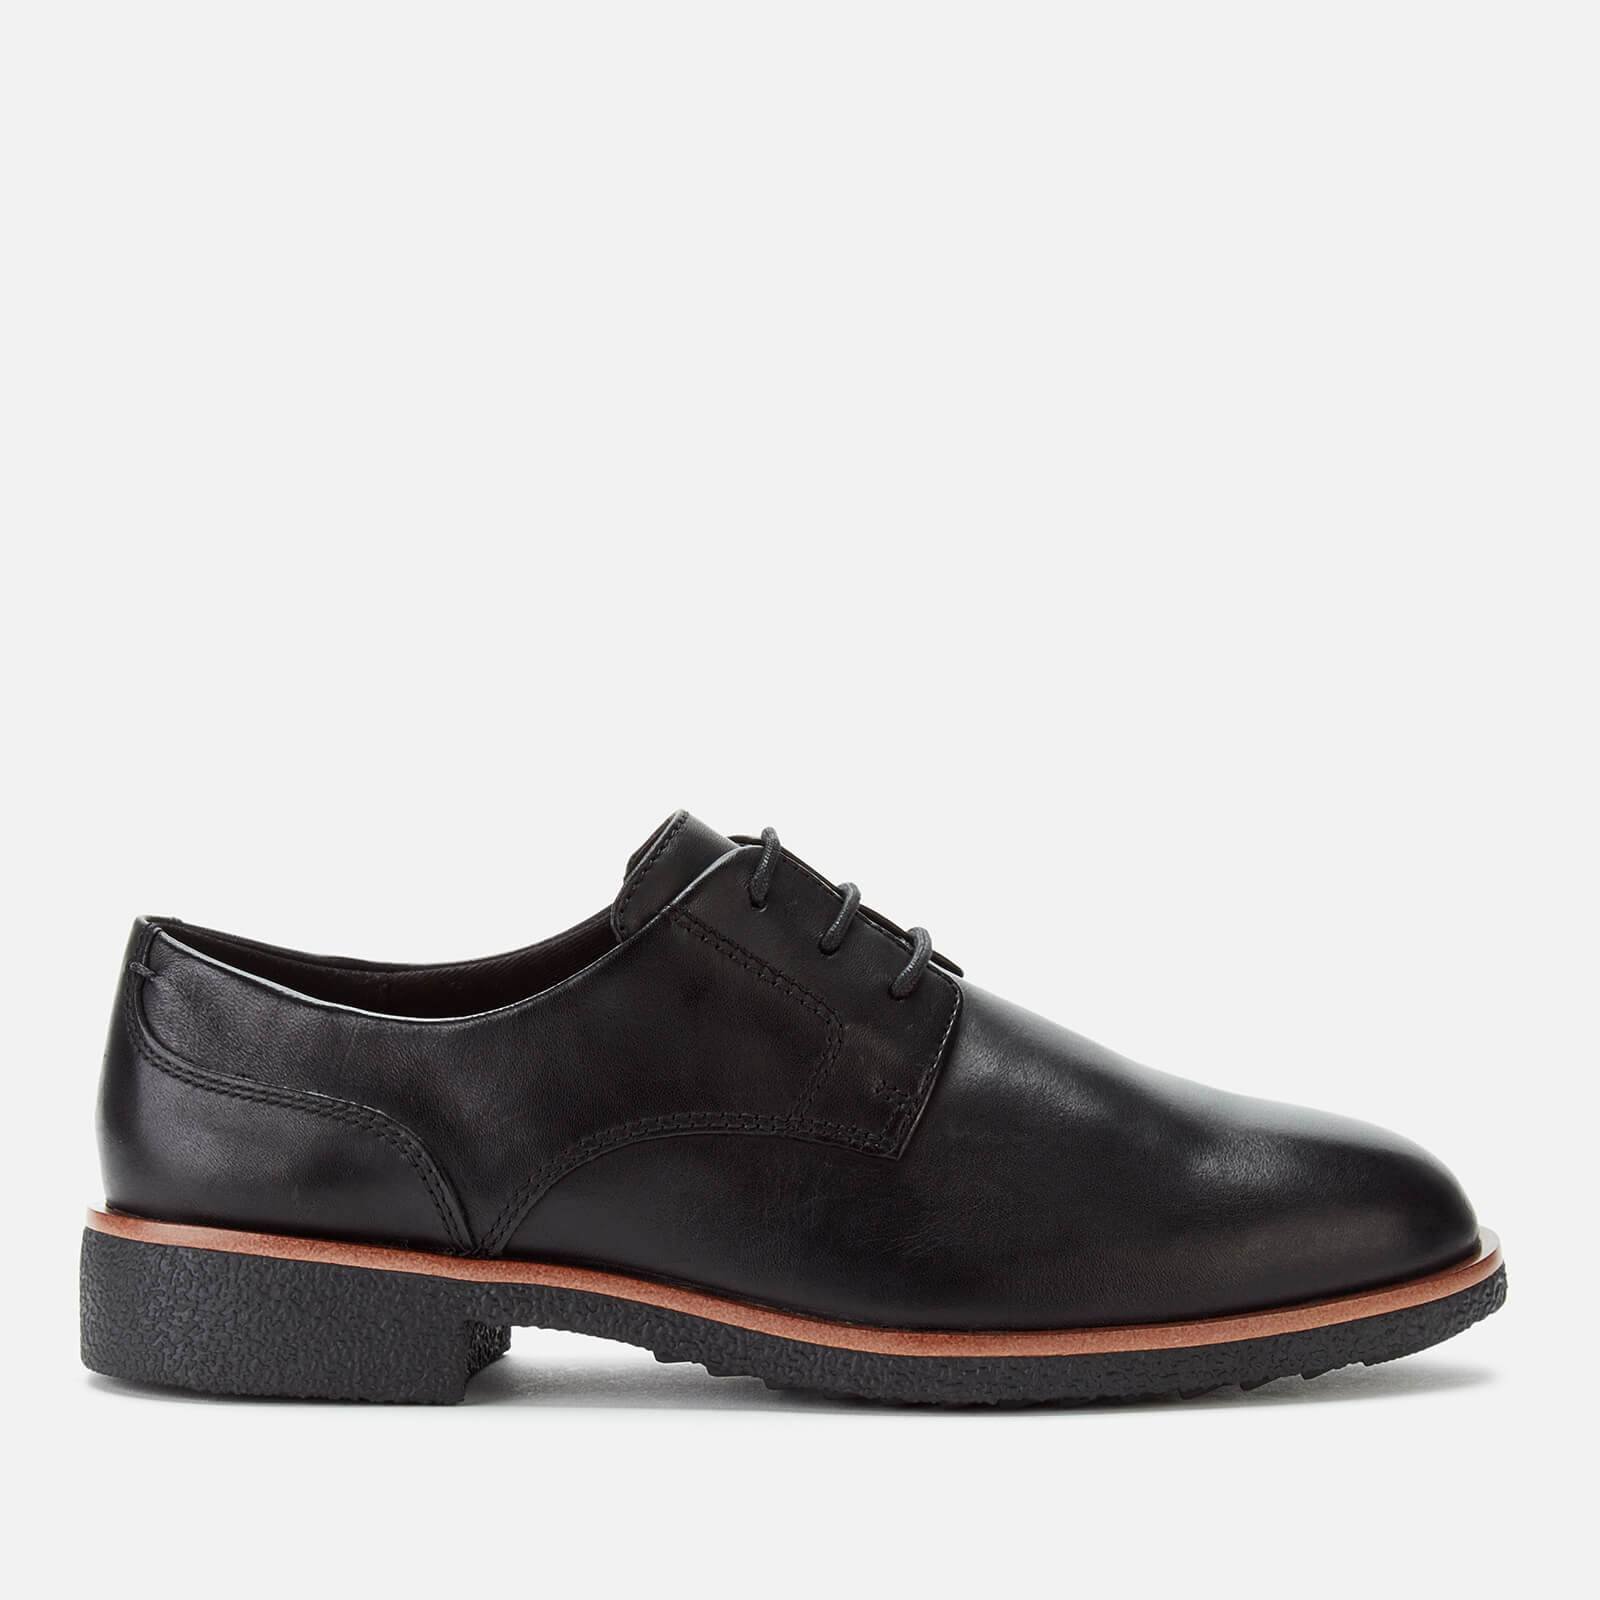 Clarks Women's Griffin Lane Leather Derby Shoes - Black - UK 8